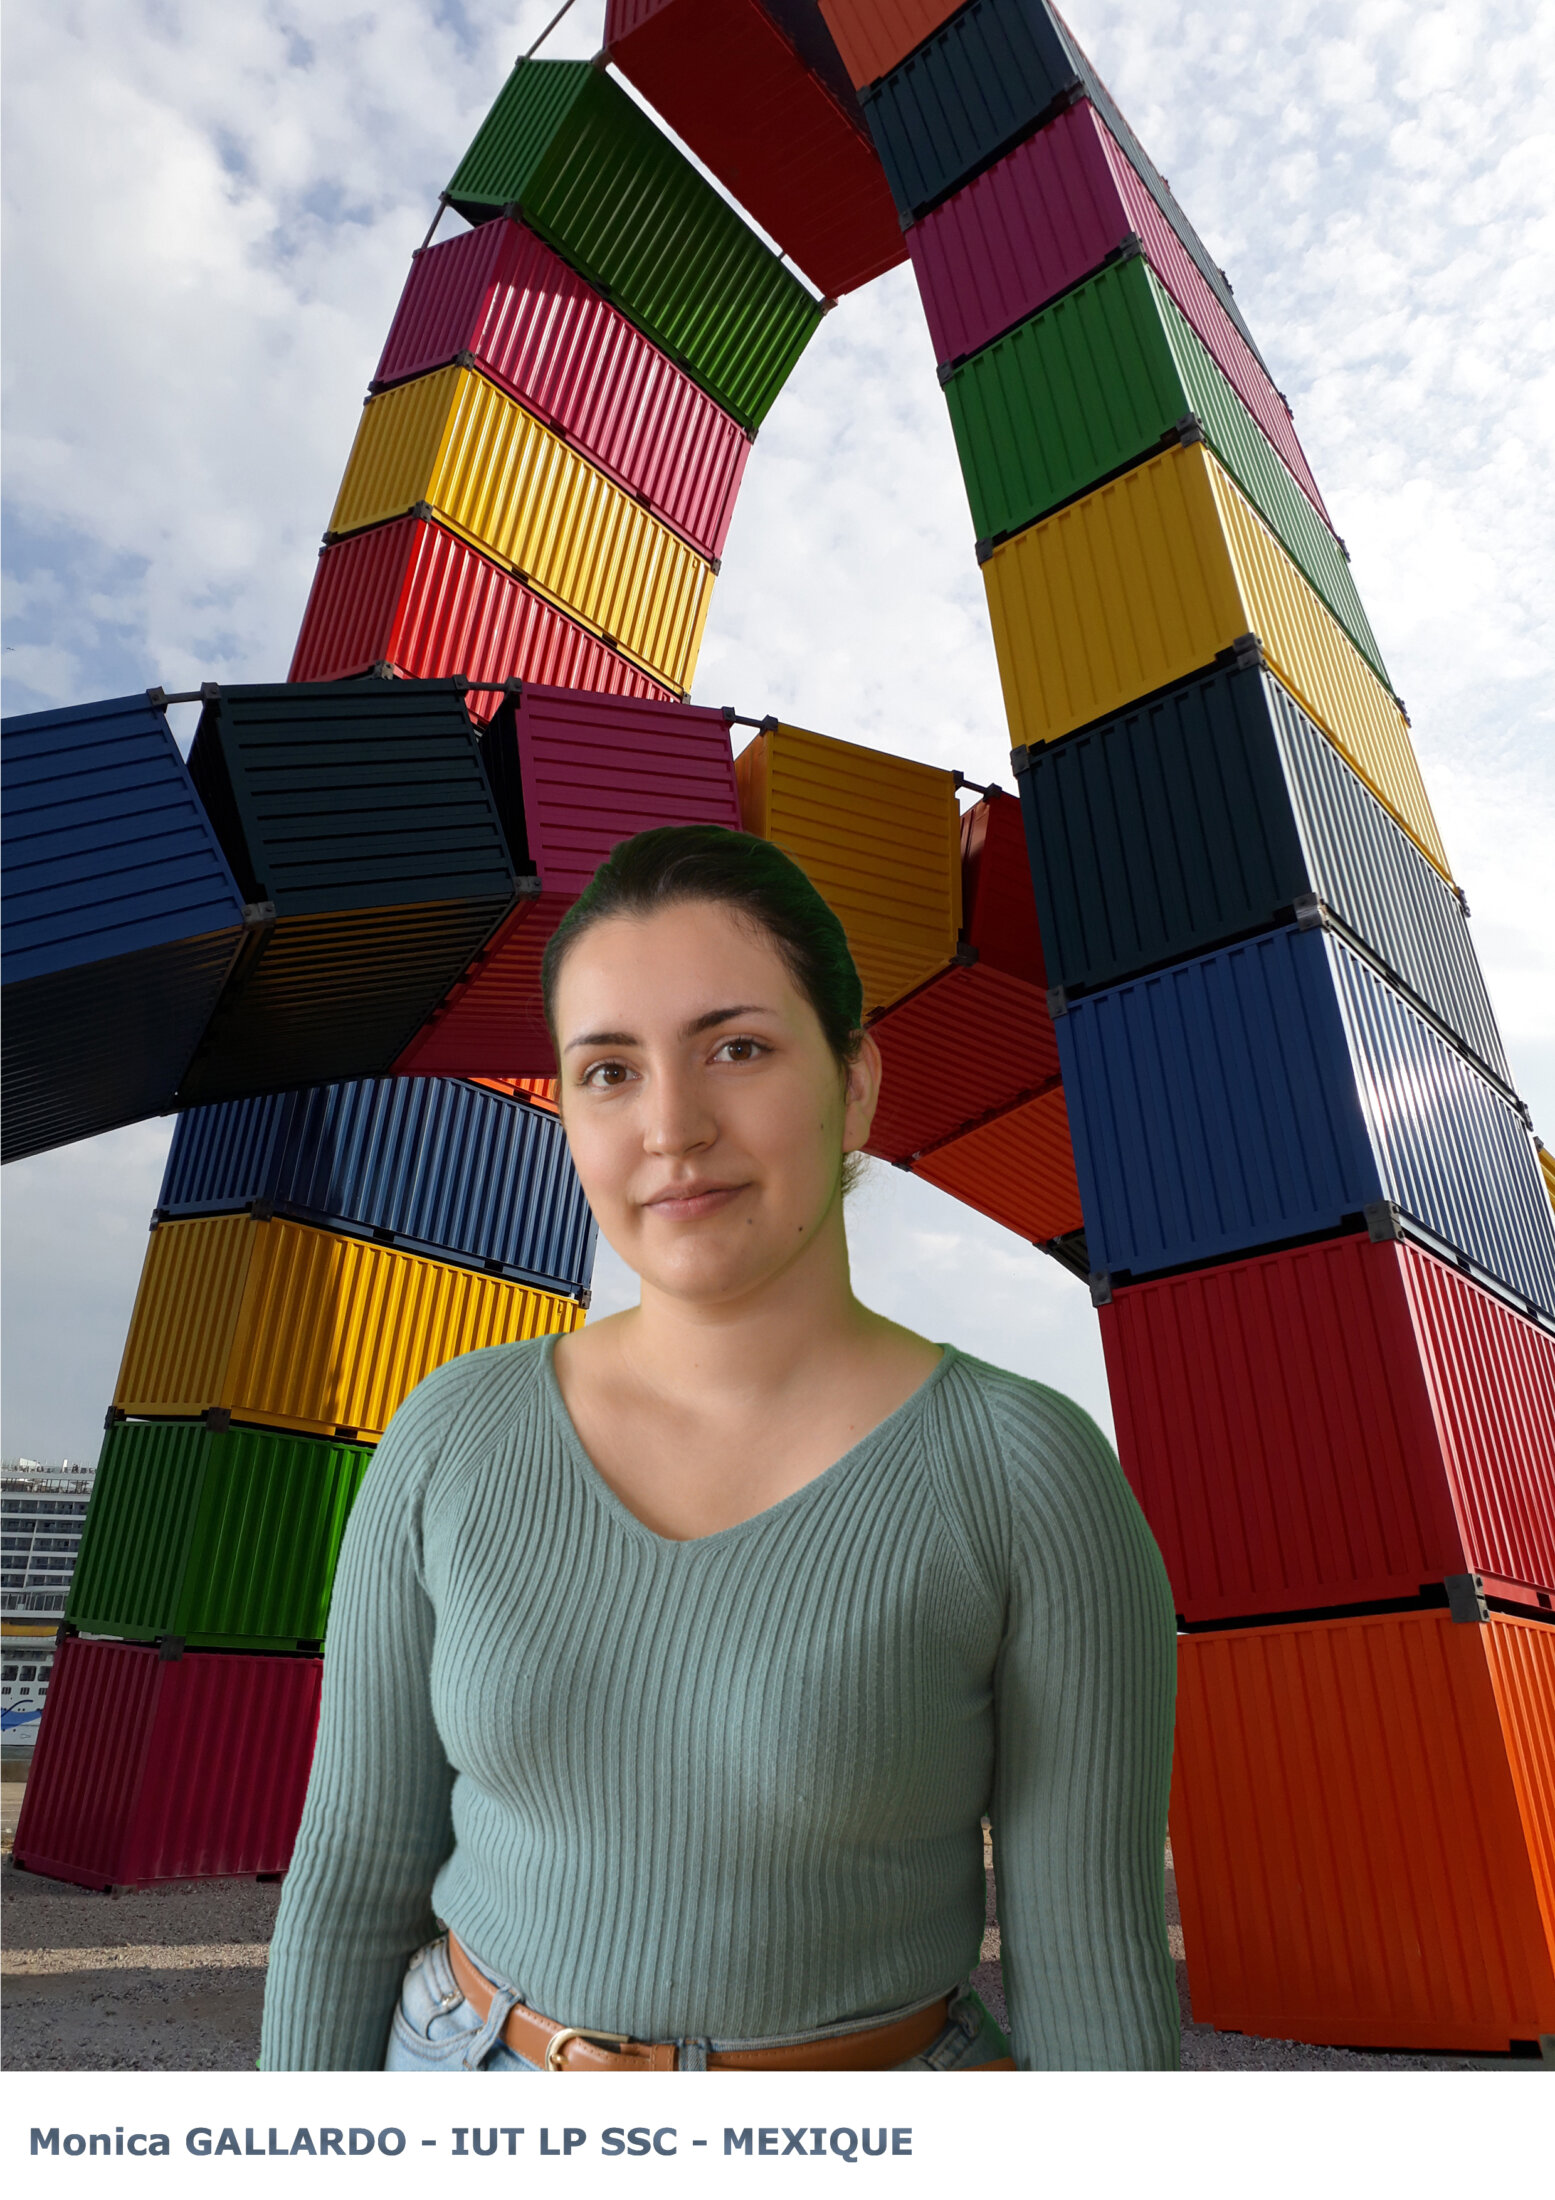 Monica GALLARDO - LP SSC - MEXIQUE